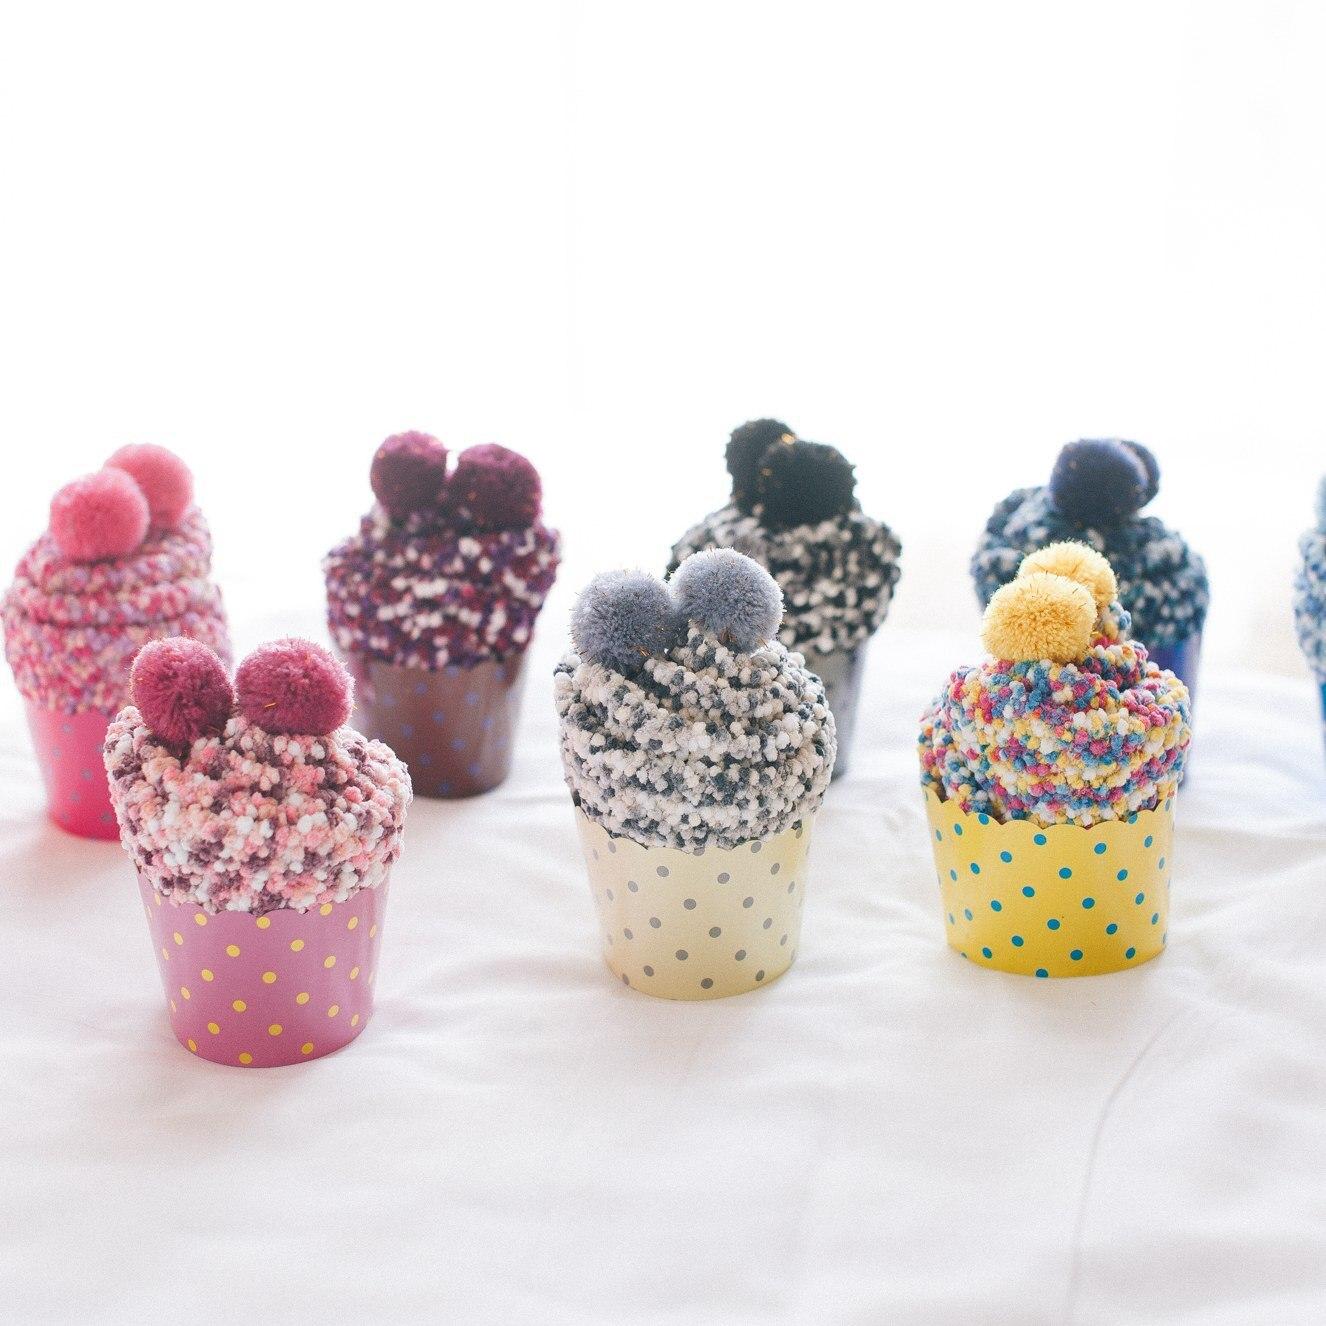 Women 's cake socks in tube bubble coral cashmere manufacturers Japanese girl socks gift box socks wholesale hair